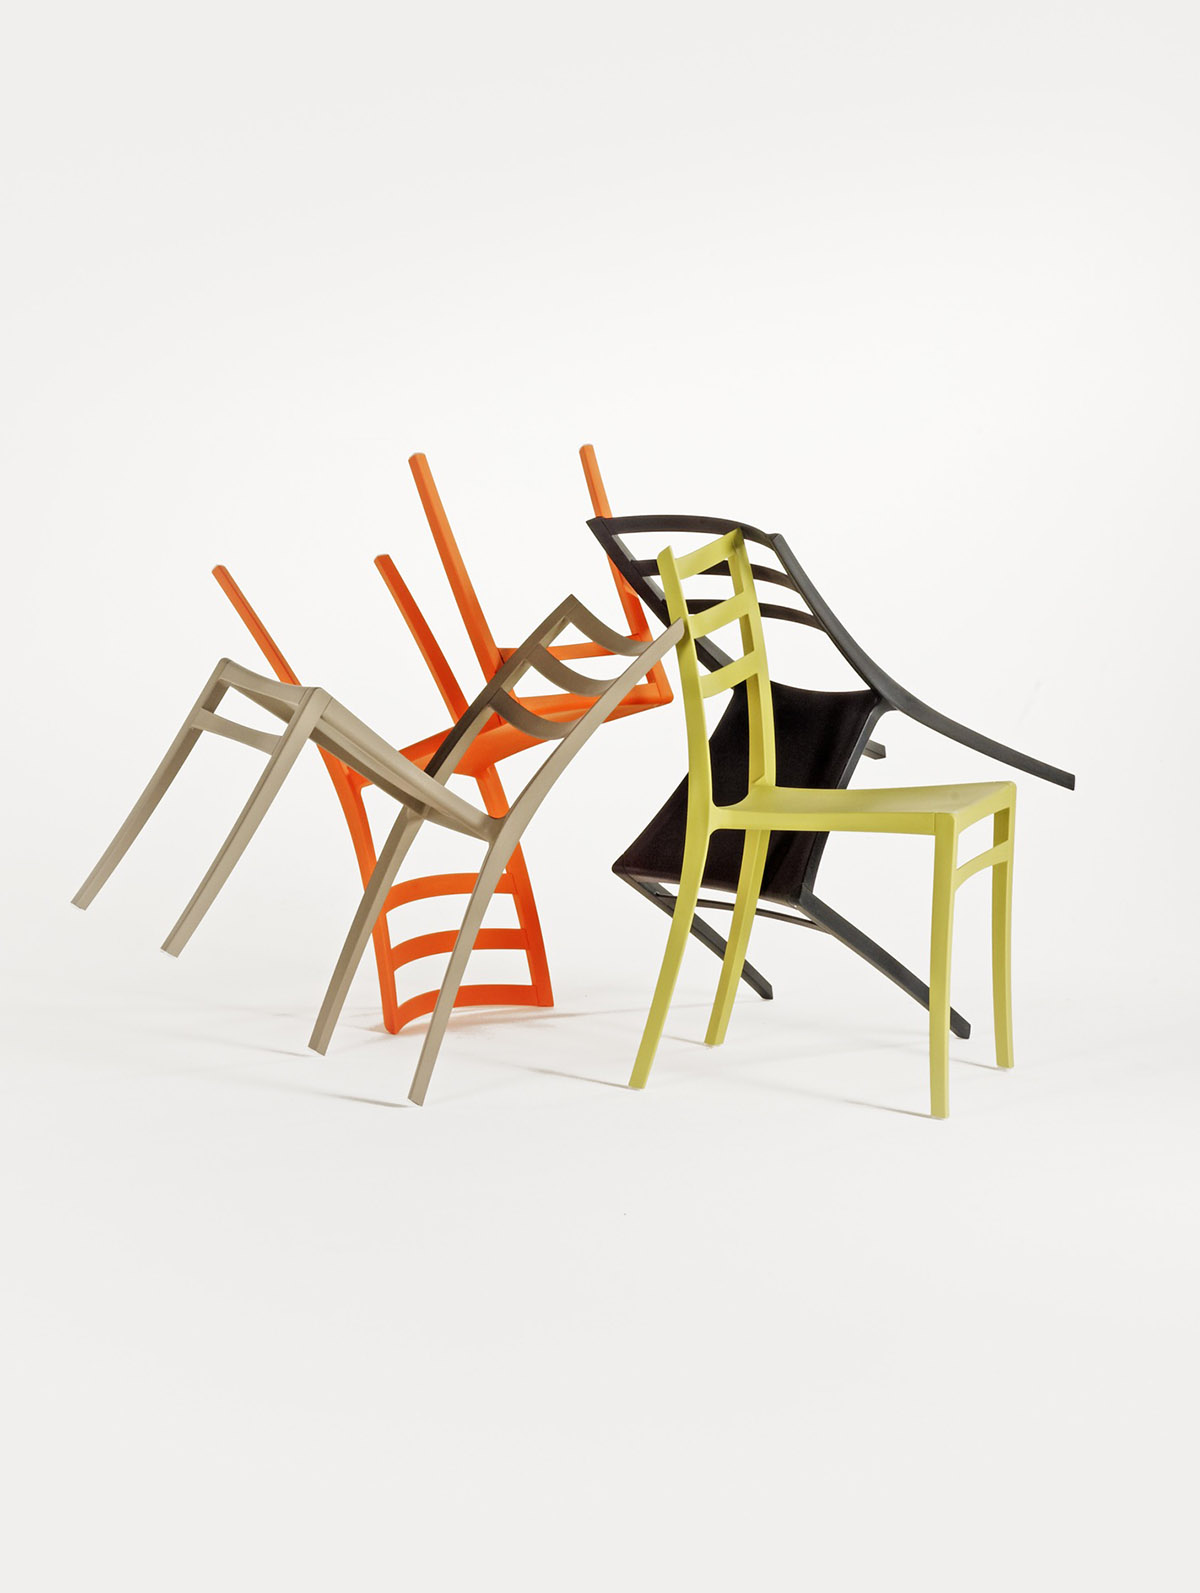 chaise color e int rieure ext rieure hmb10 sbn hotel. Black Bedroom Furniture Sets. Home Design Ideas